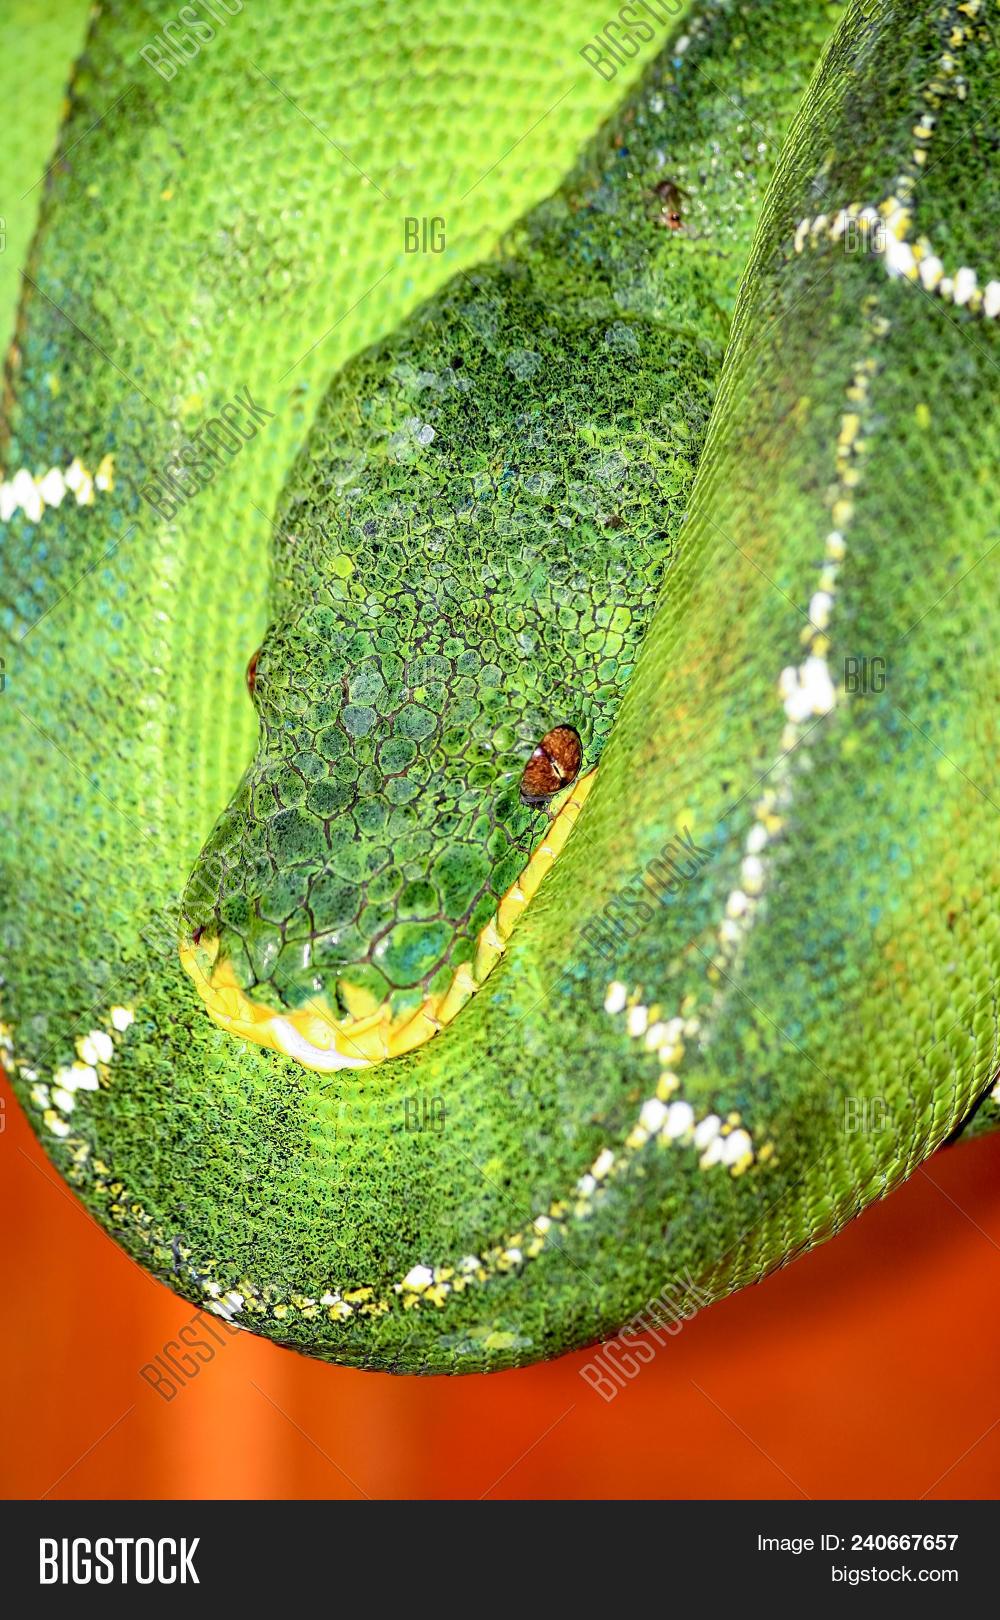 Amazon Basin Emerald Image & Photo (Free Trial) | Bigstock